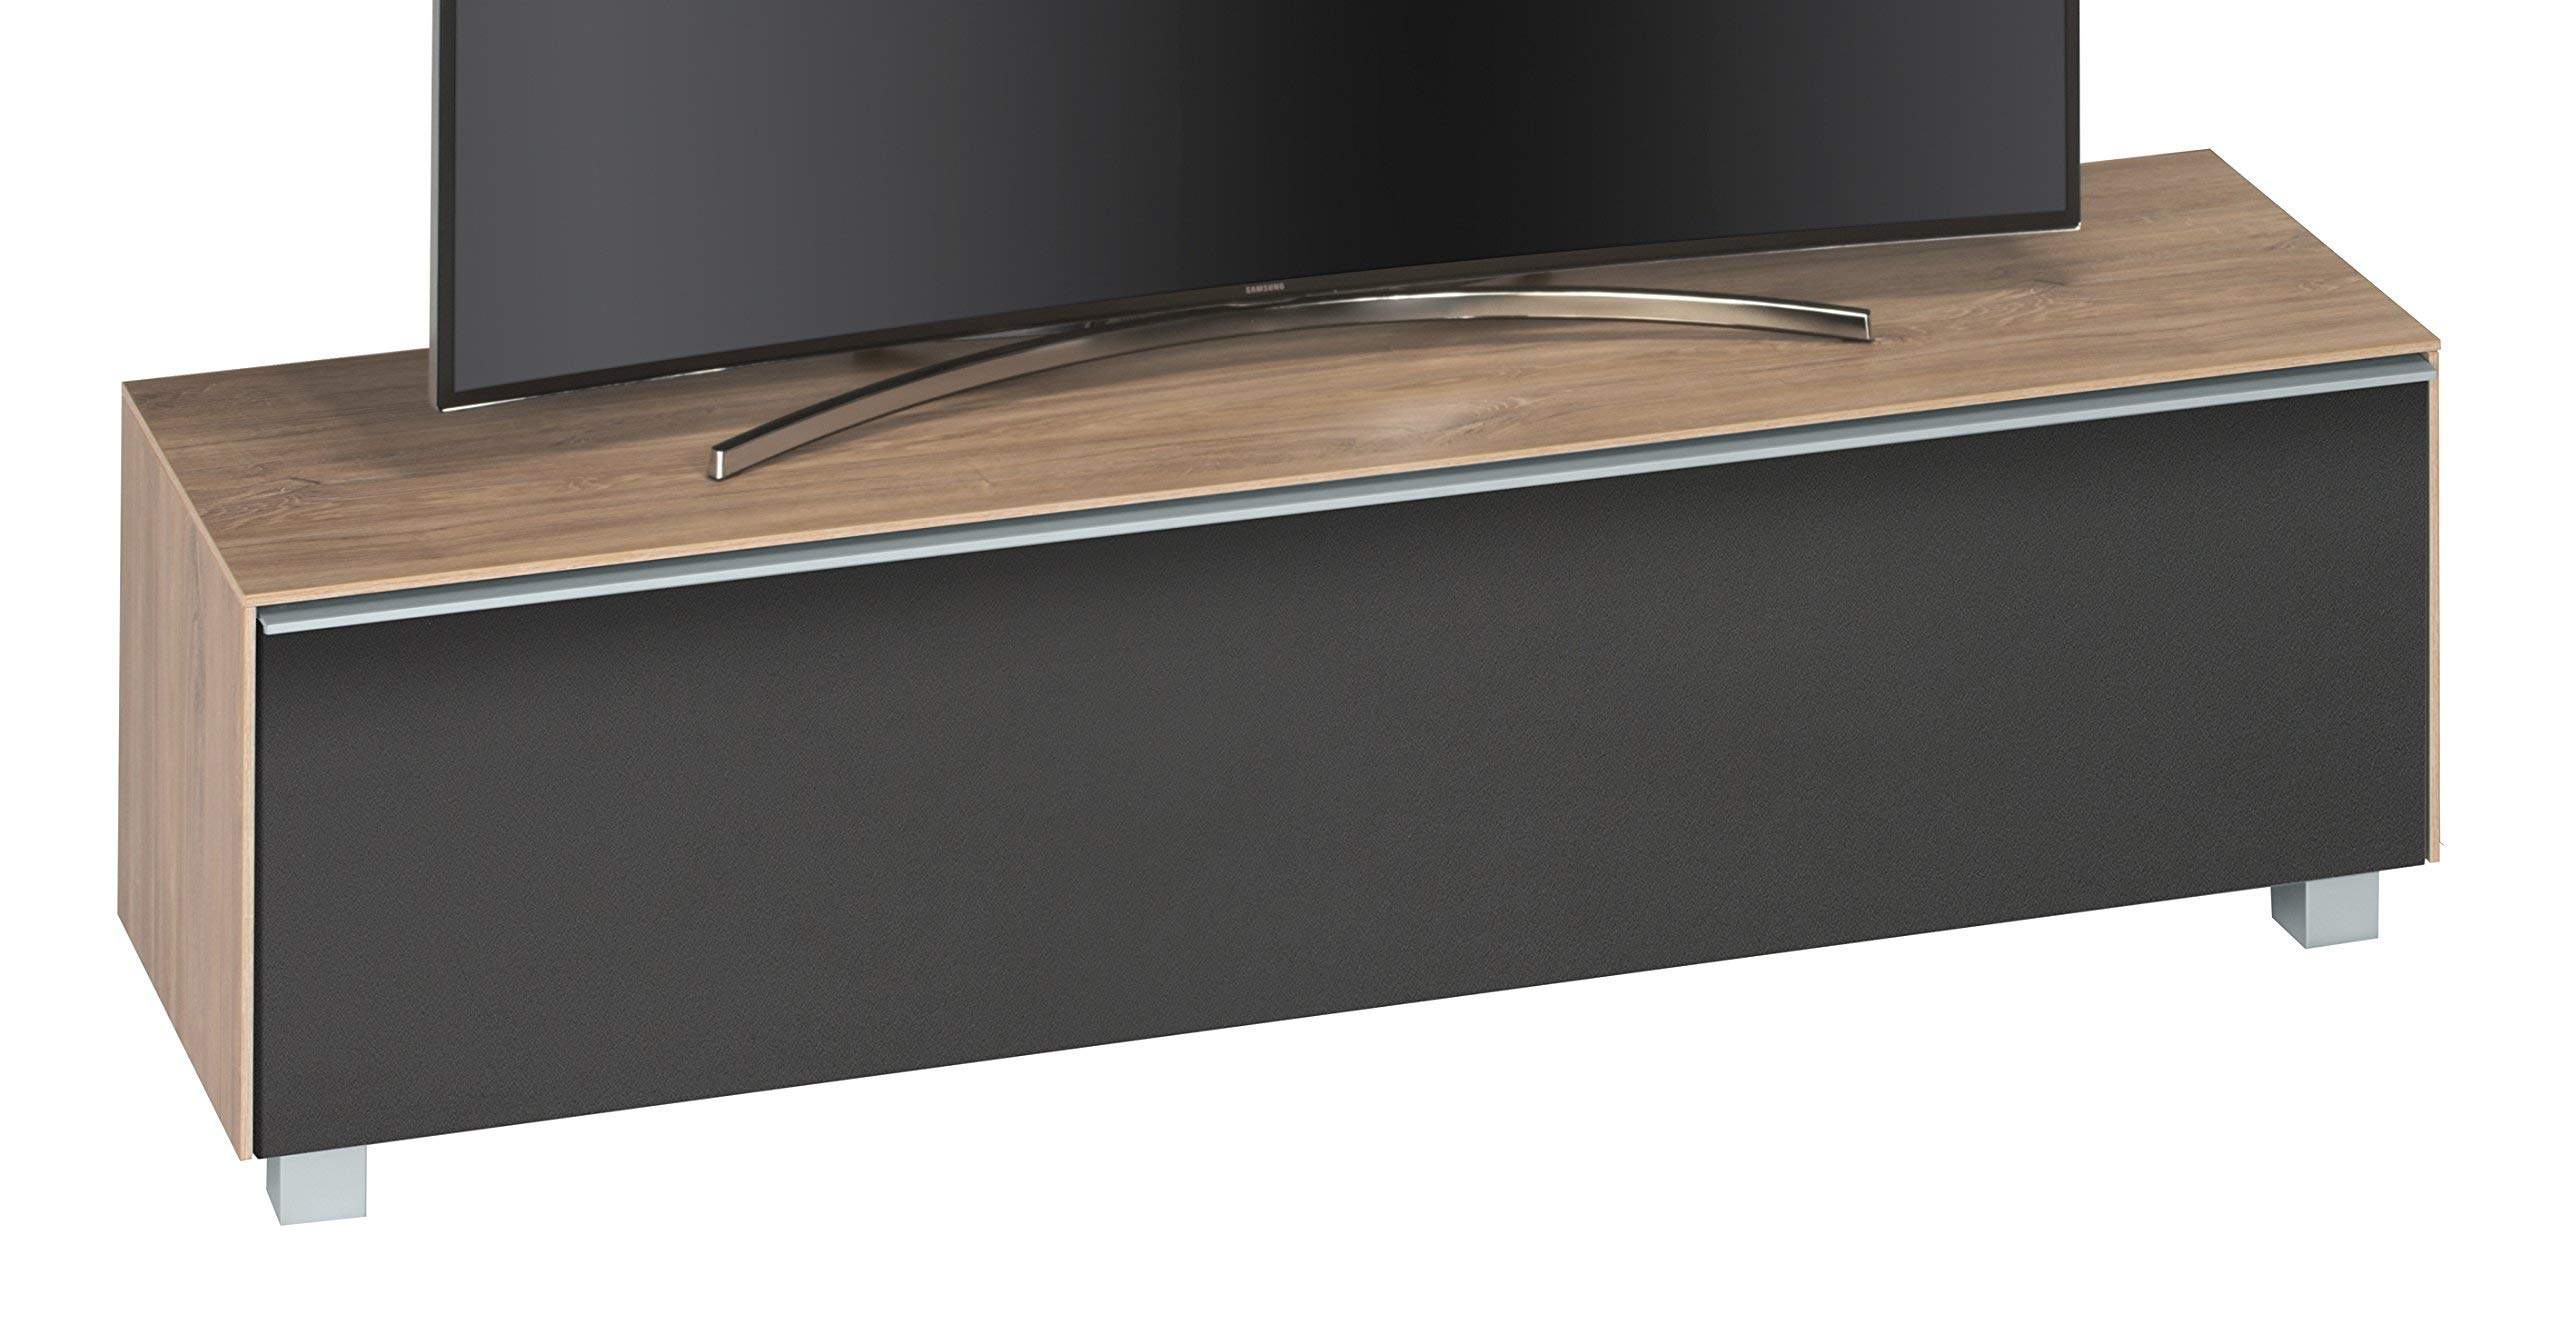 maja mobel soundconcept wood 7730 soundboard eiche hell akustikstoff schwarz abmessungen bxhxt